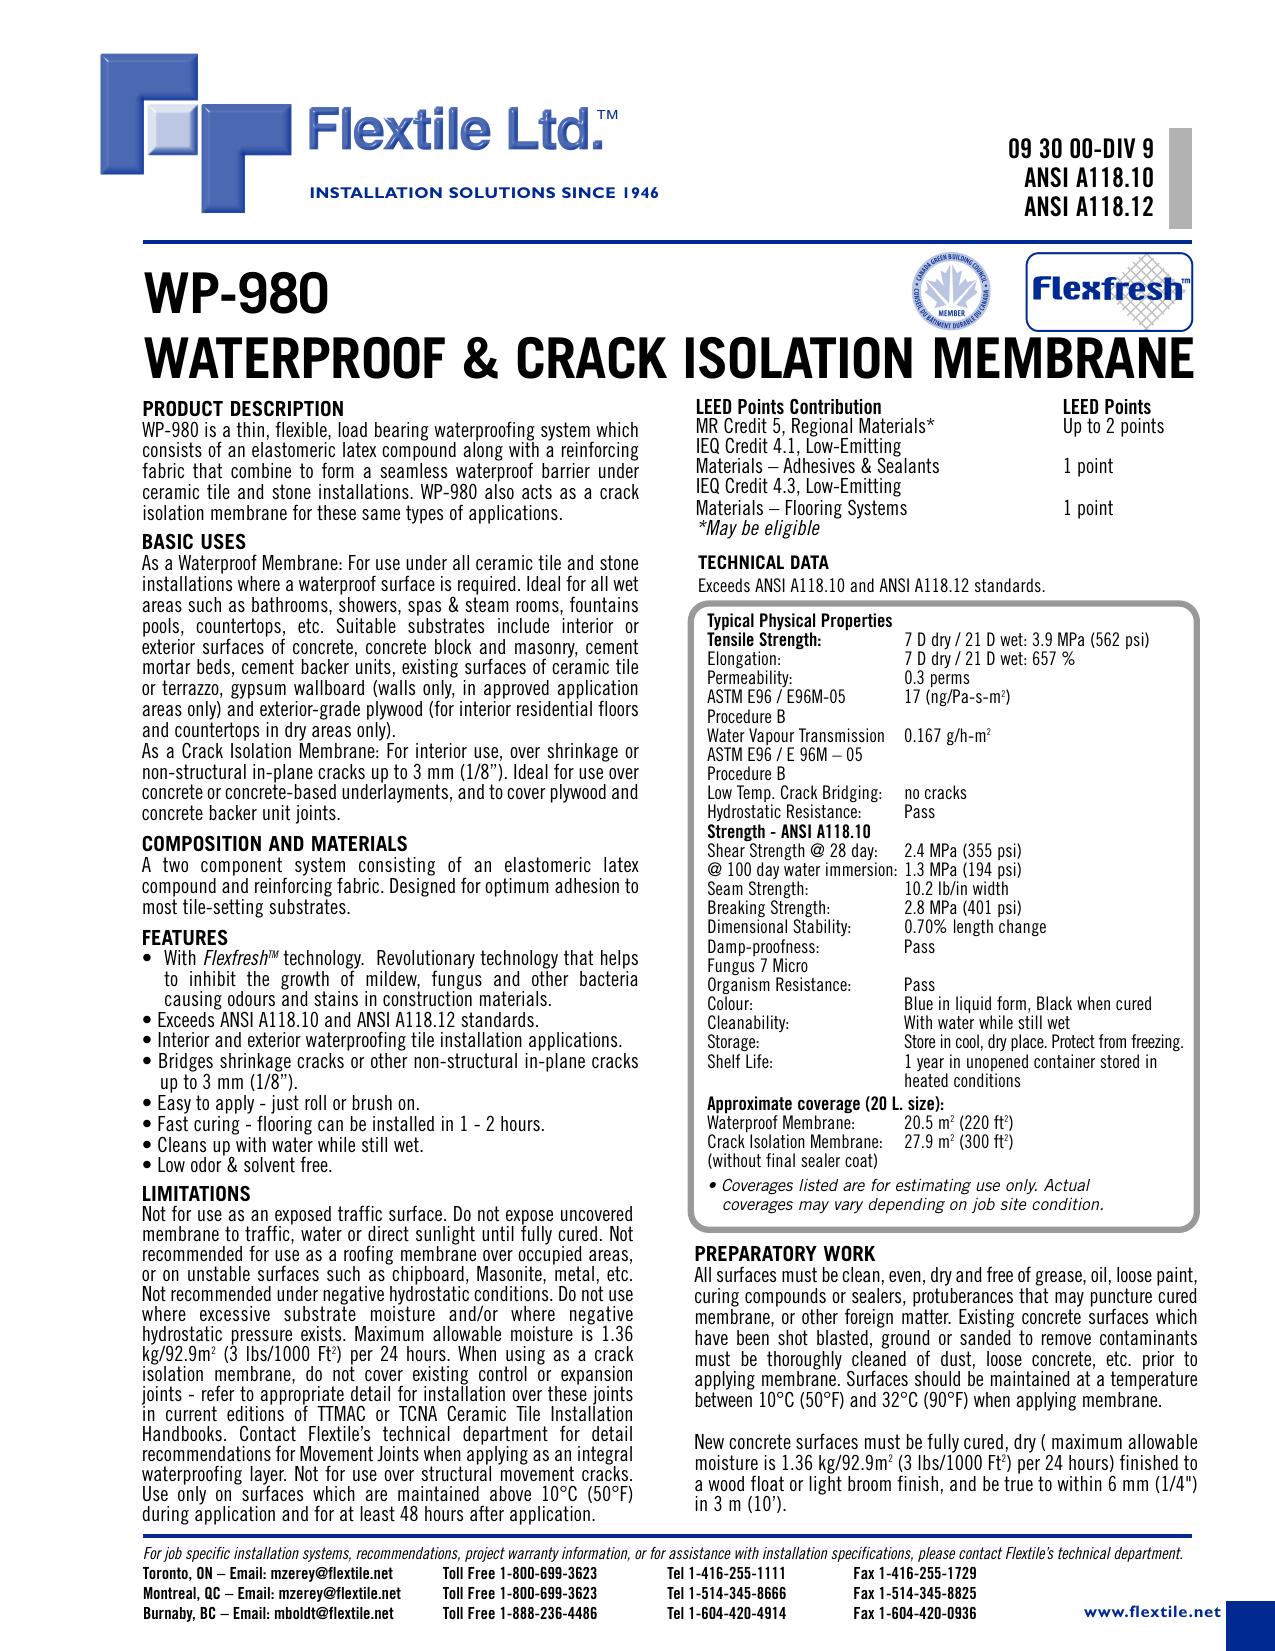 crack isolation membrane for concrete